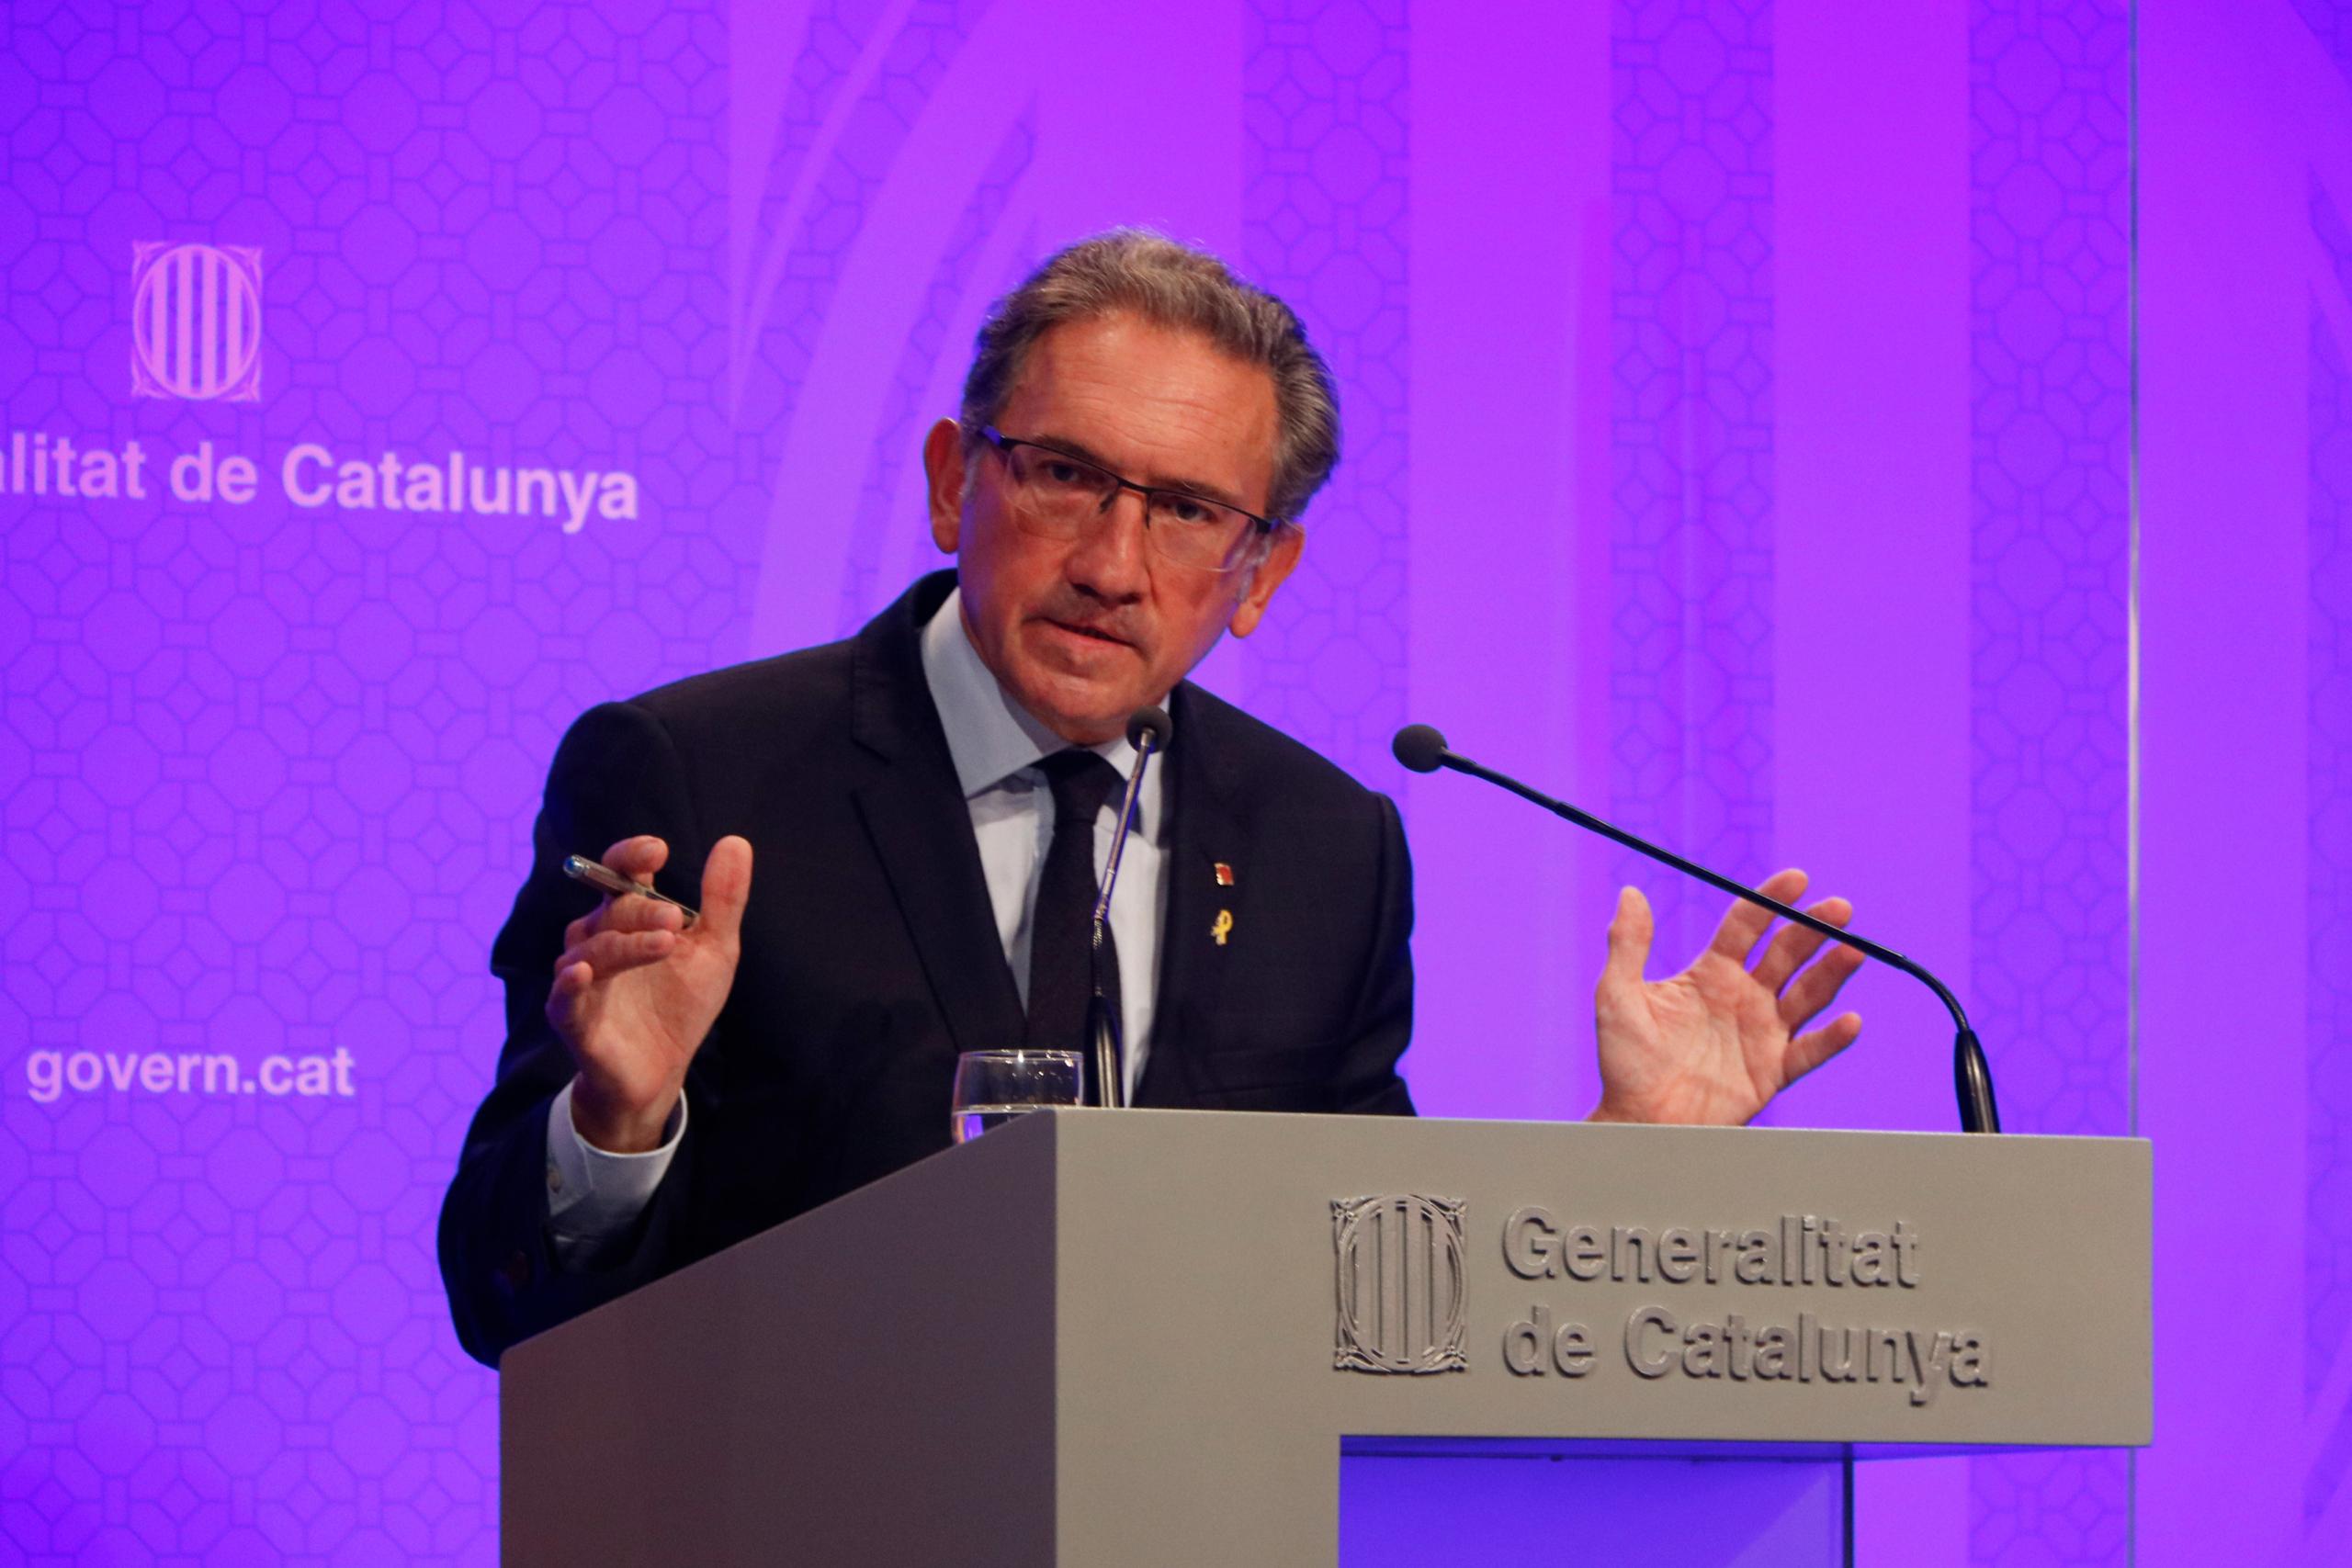 El conseller d'Economia i Hisenda, Jaume Giró   ACN